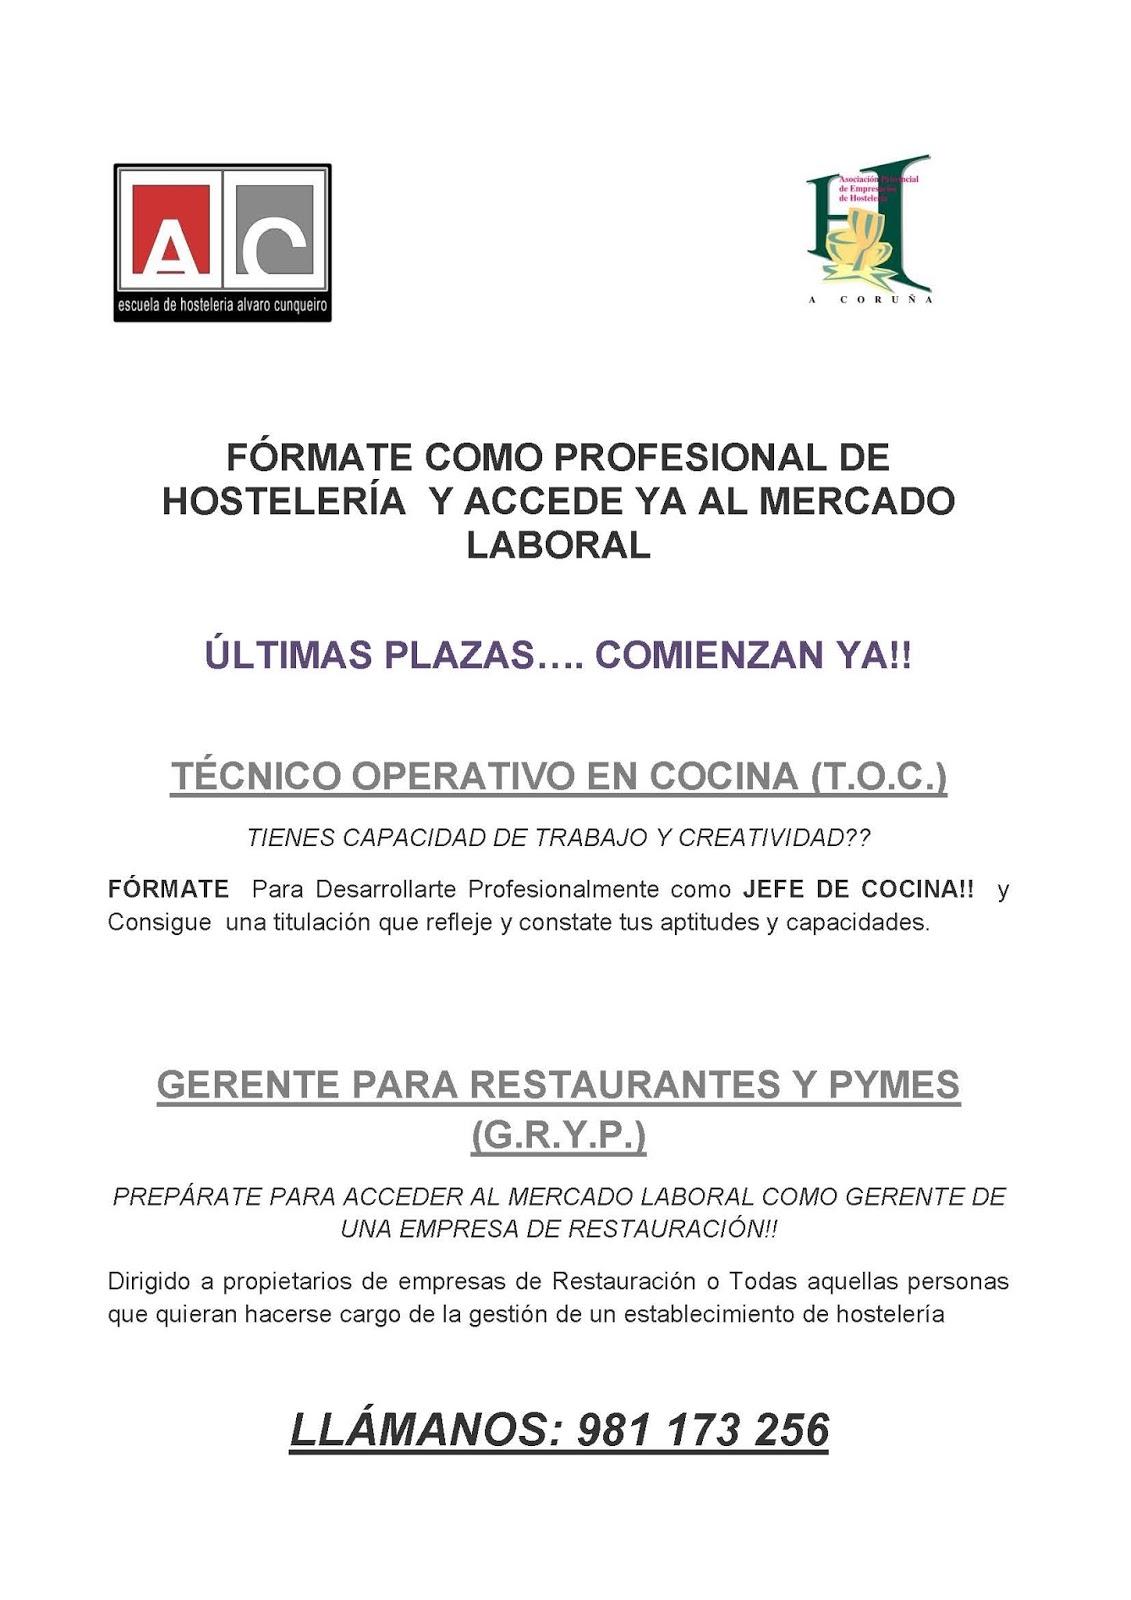 Mi mundo descubriendo escuela de hosteler a lvaro cunqueiro - Ofertas de empleo jefe de cocina ...